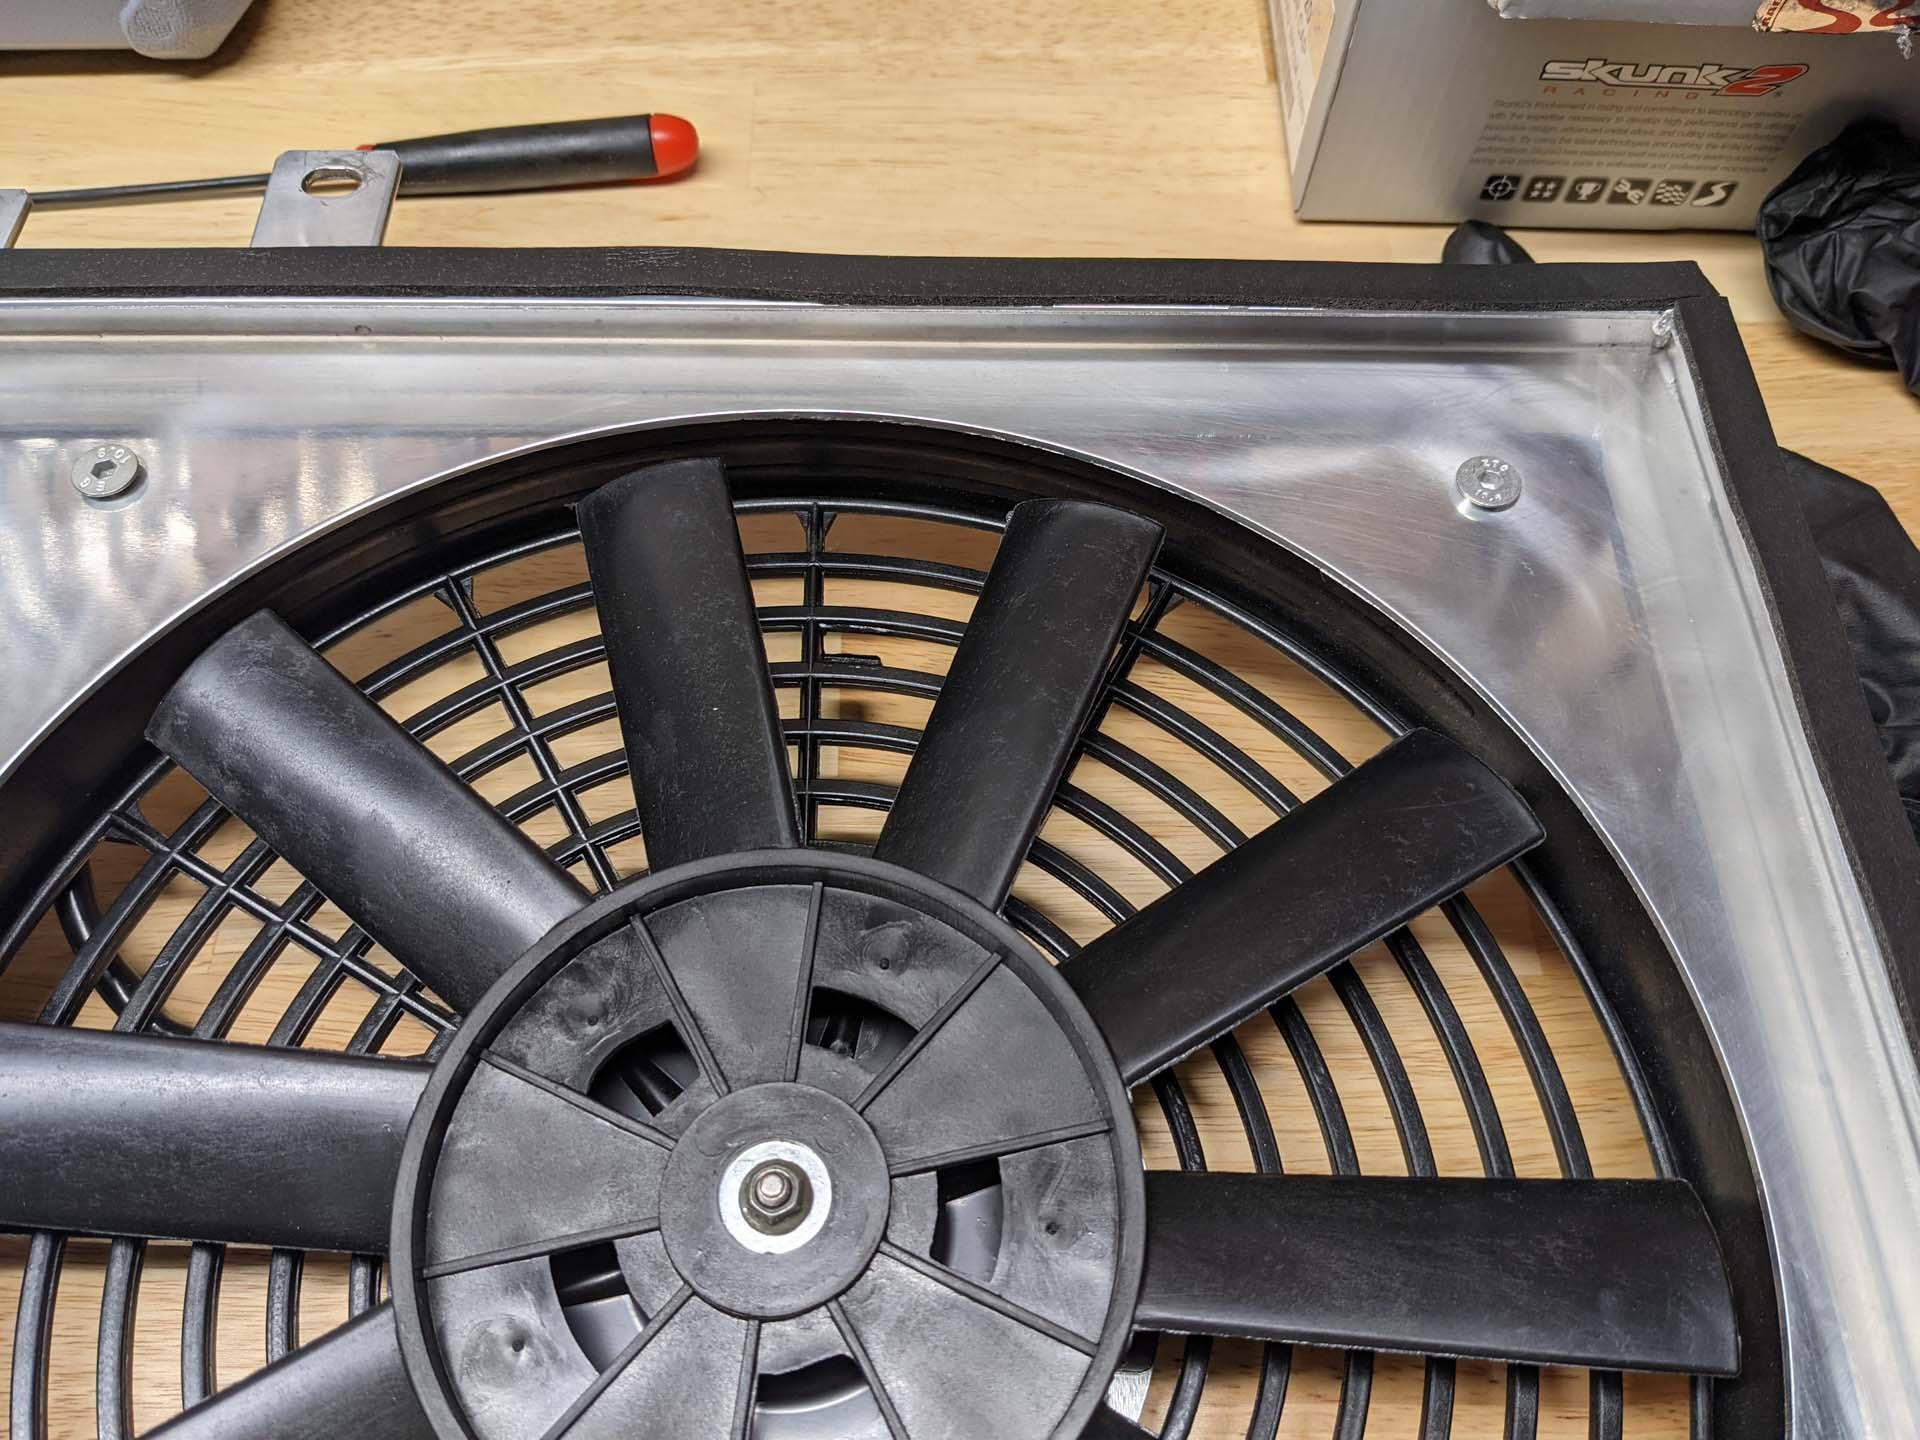 Molding around the fan shroud